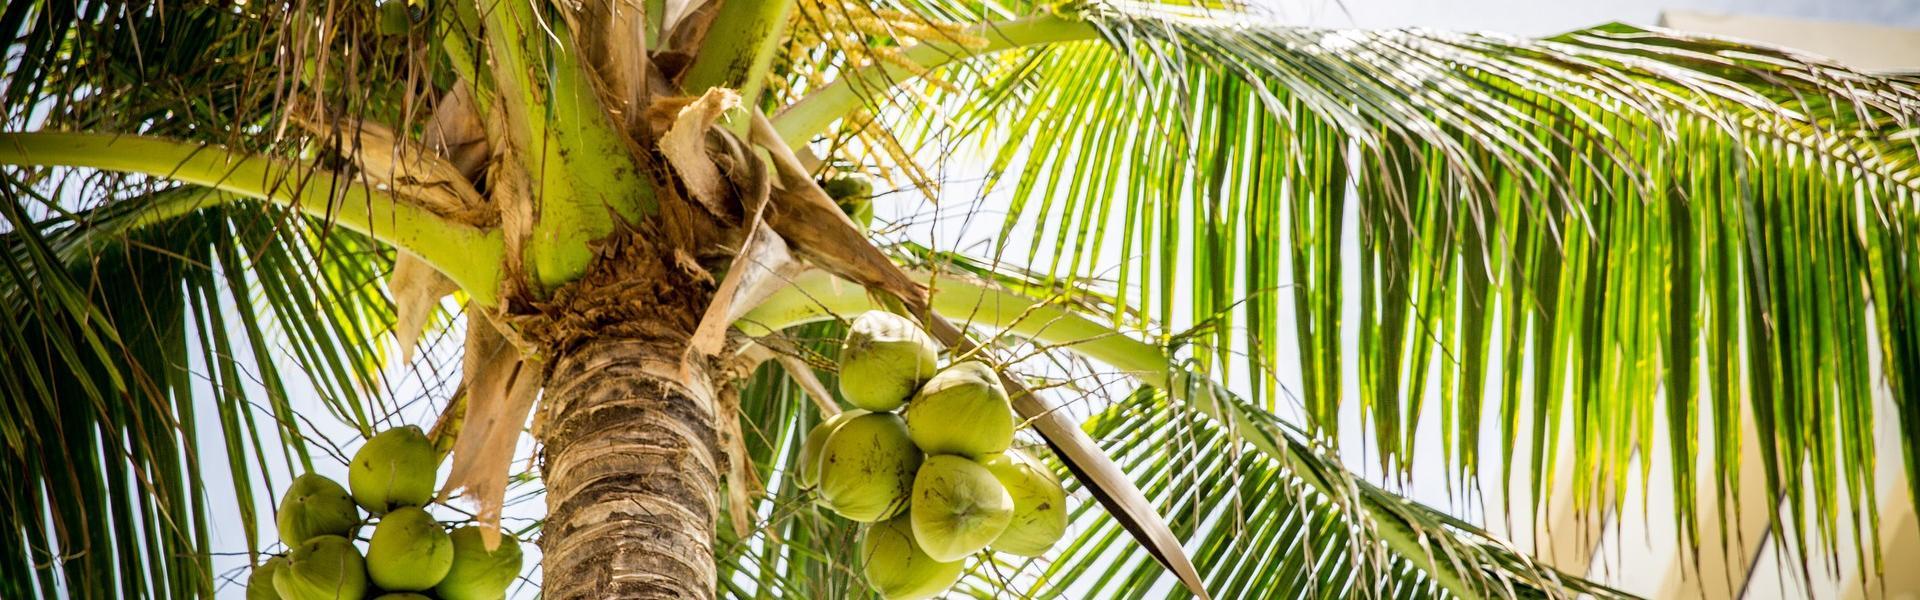 Supply vs. Demand of Coconut: An Unprepared Caribbean?